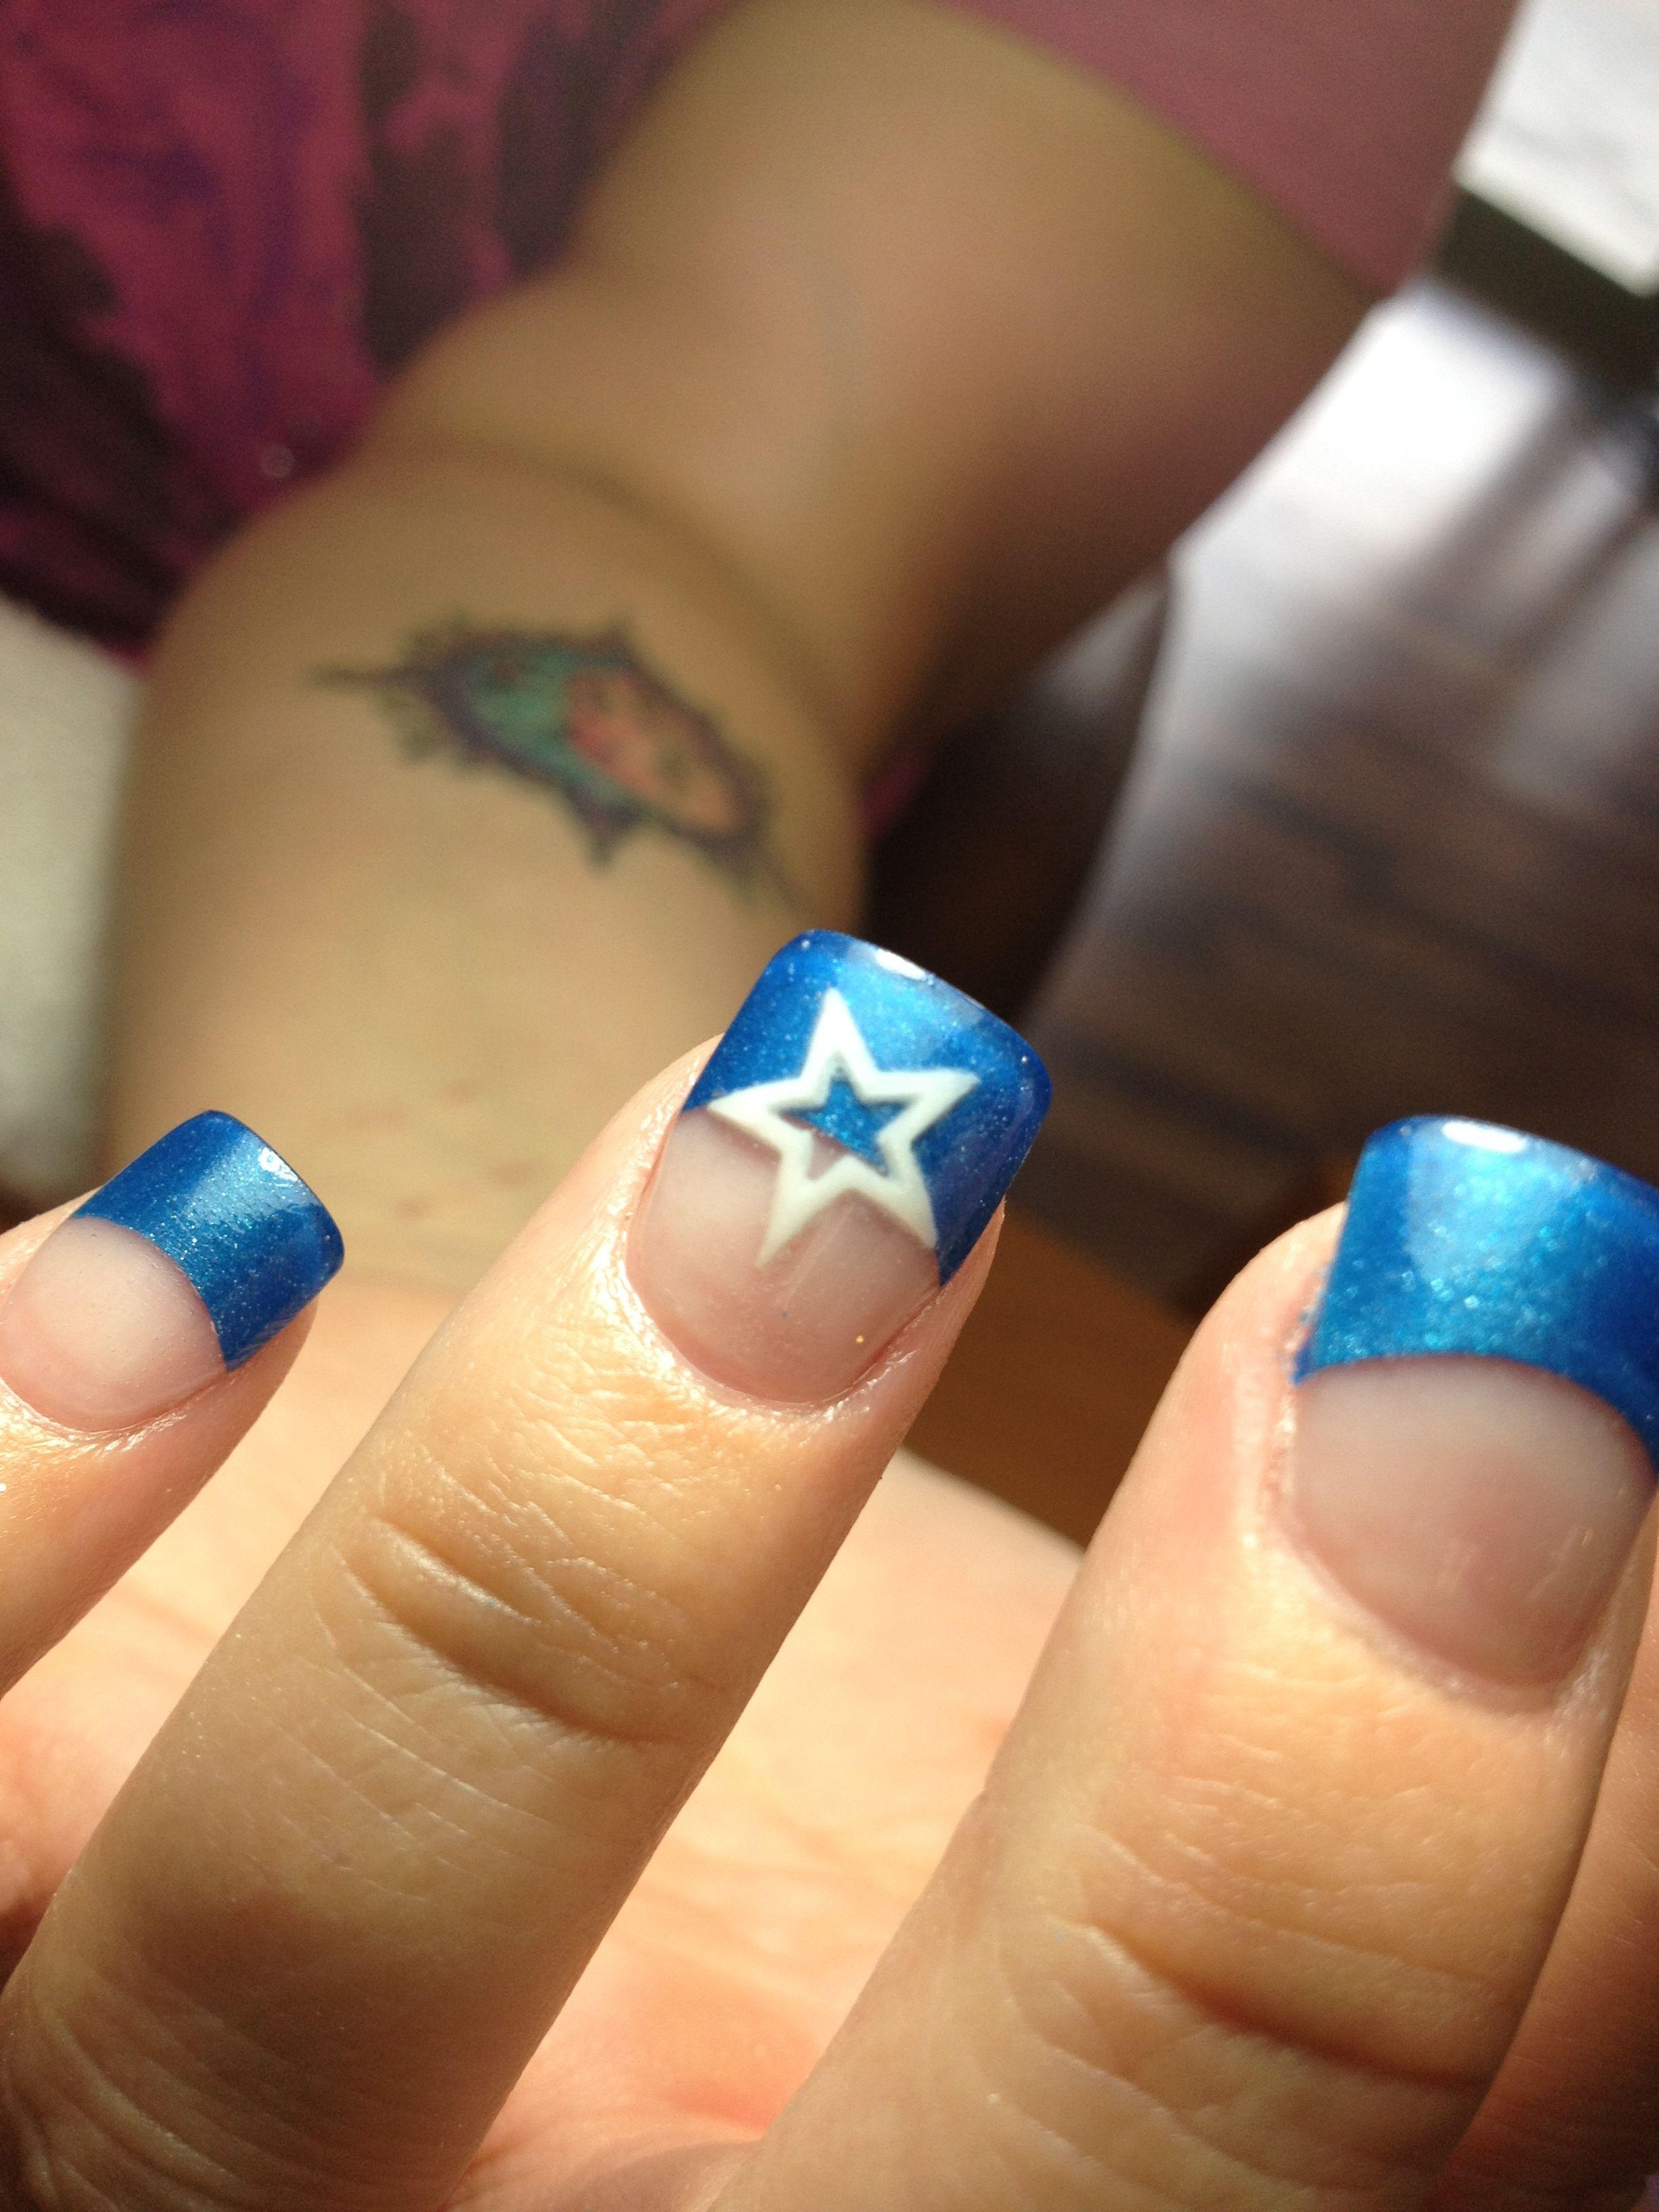 Dallas Cowboy Nails | Mani,Pedi | Pinterest | Dallas cowboys nails ...